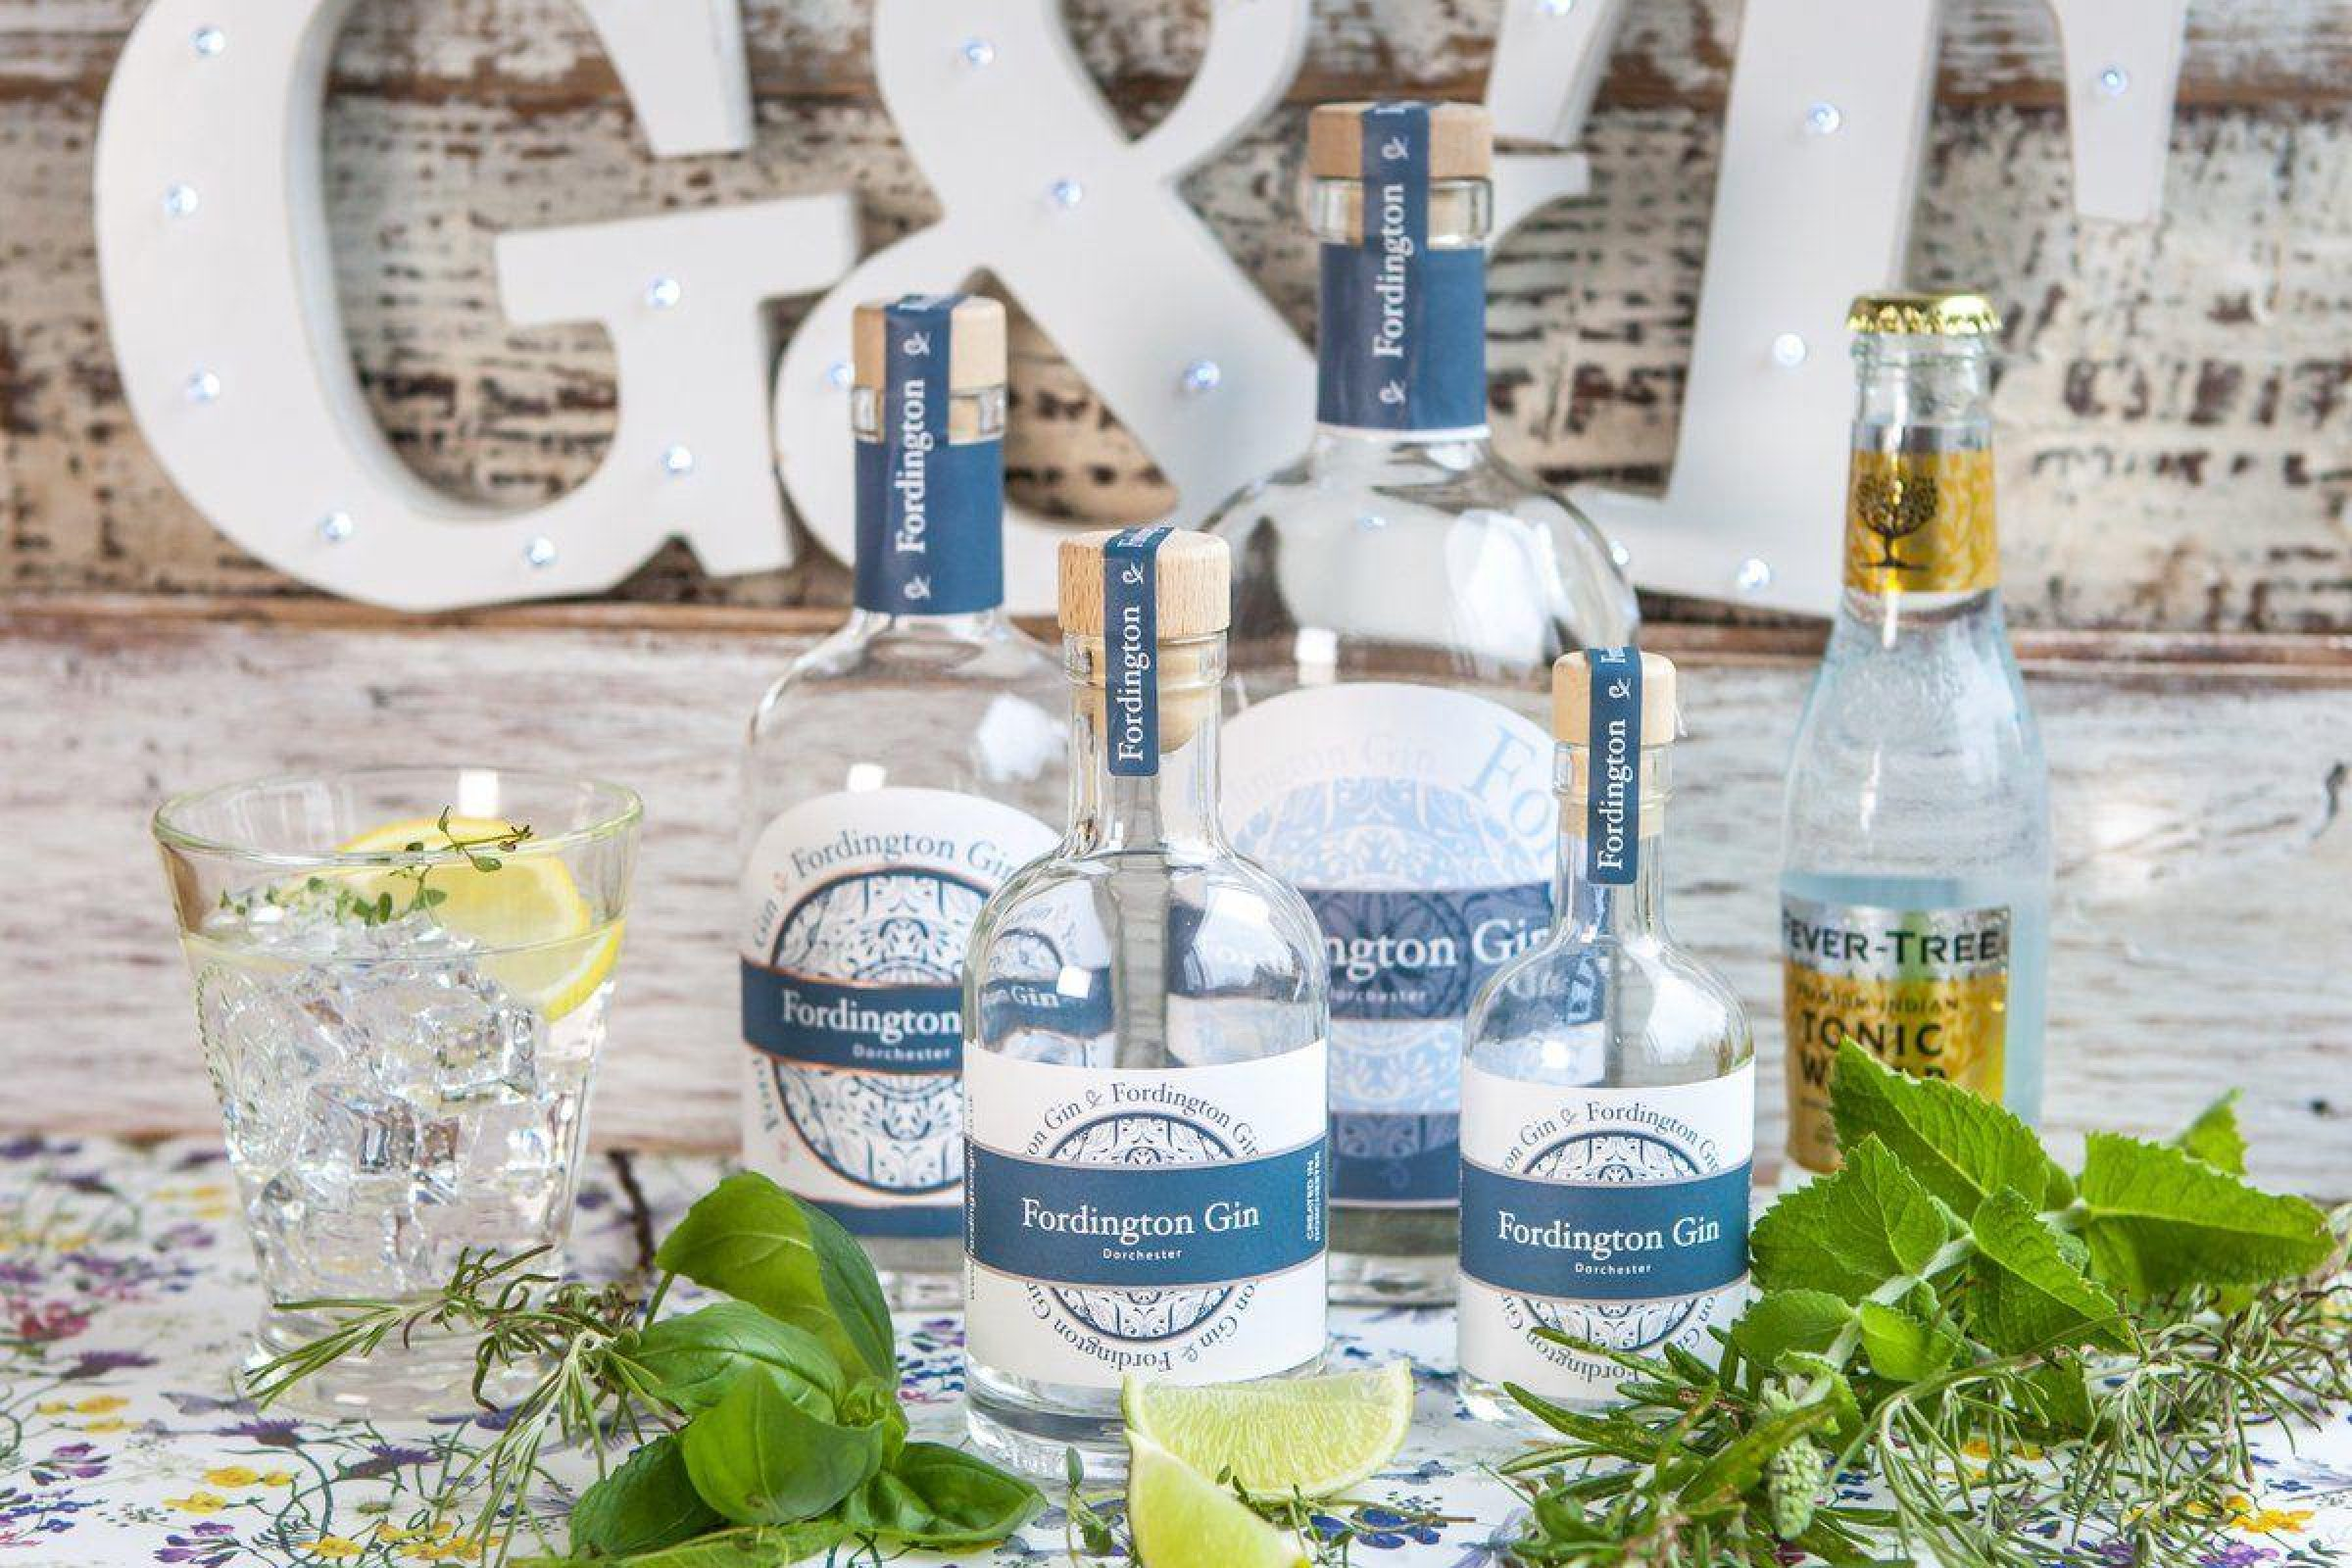 Fordington Gin is made in Dorchester Dorset